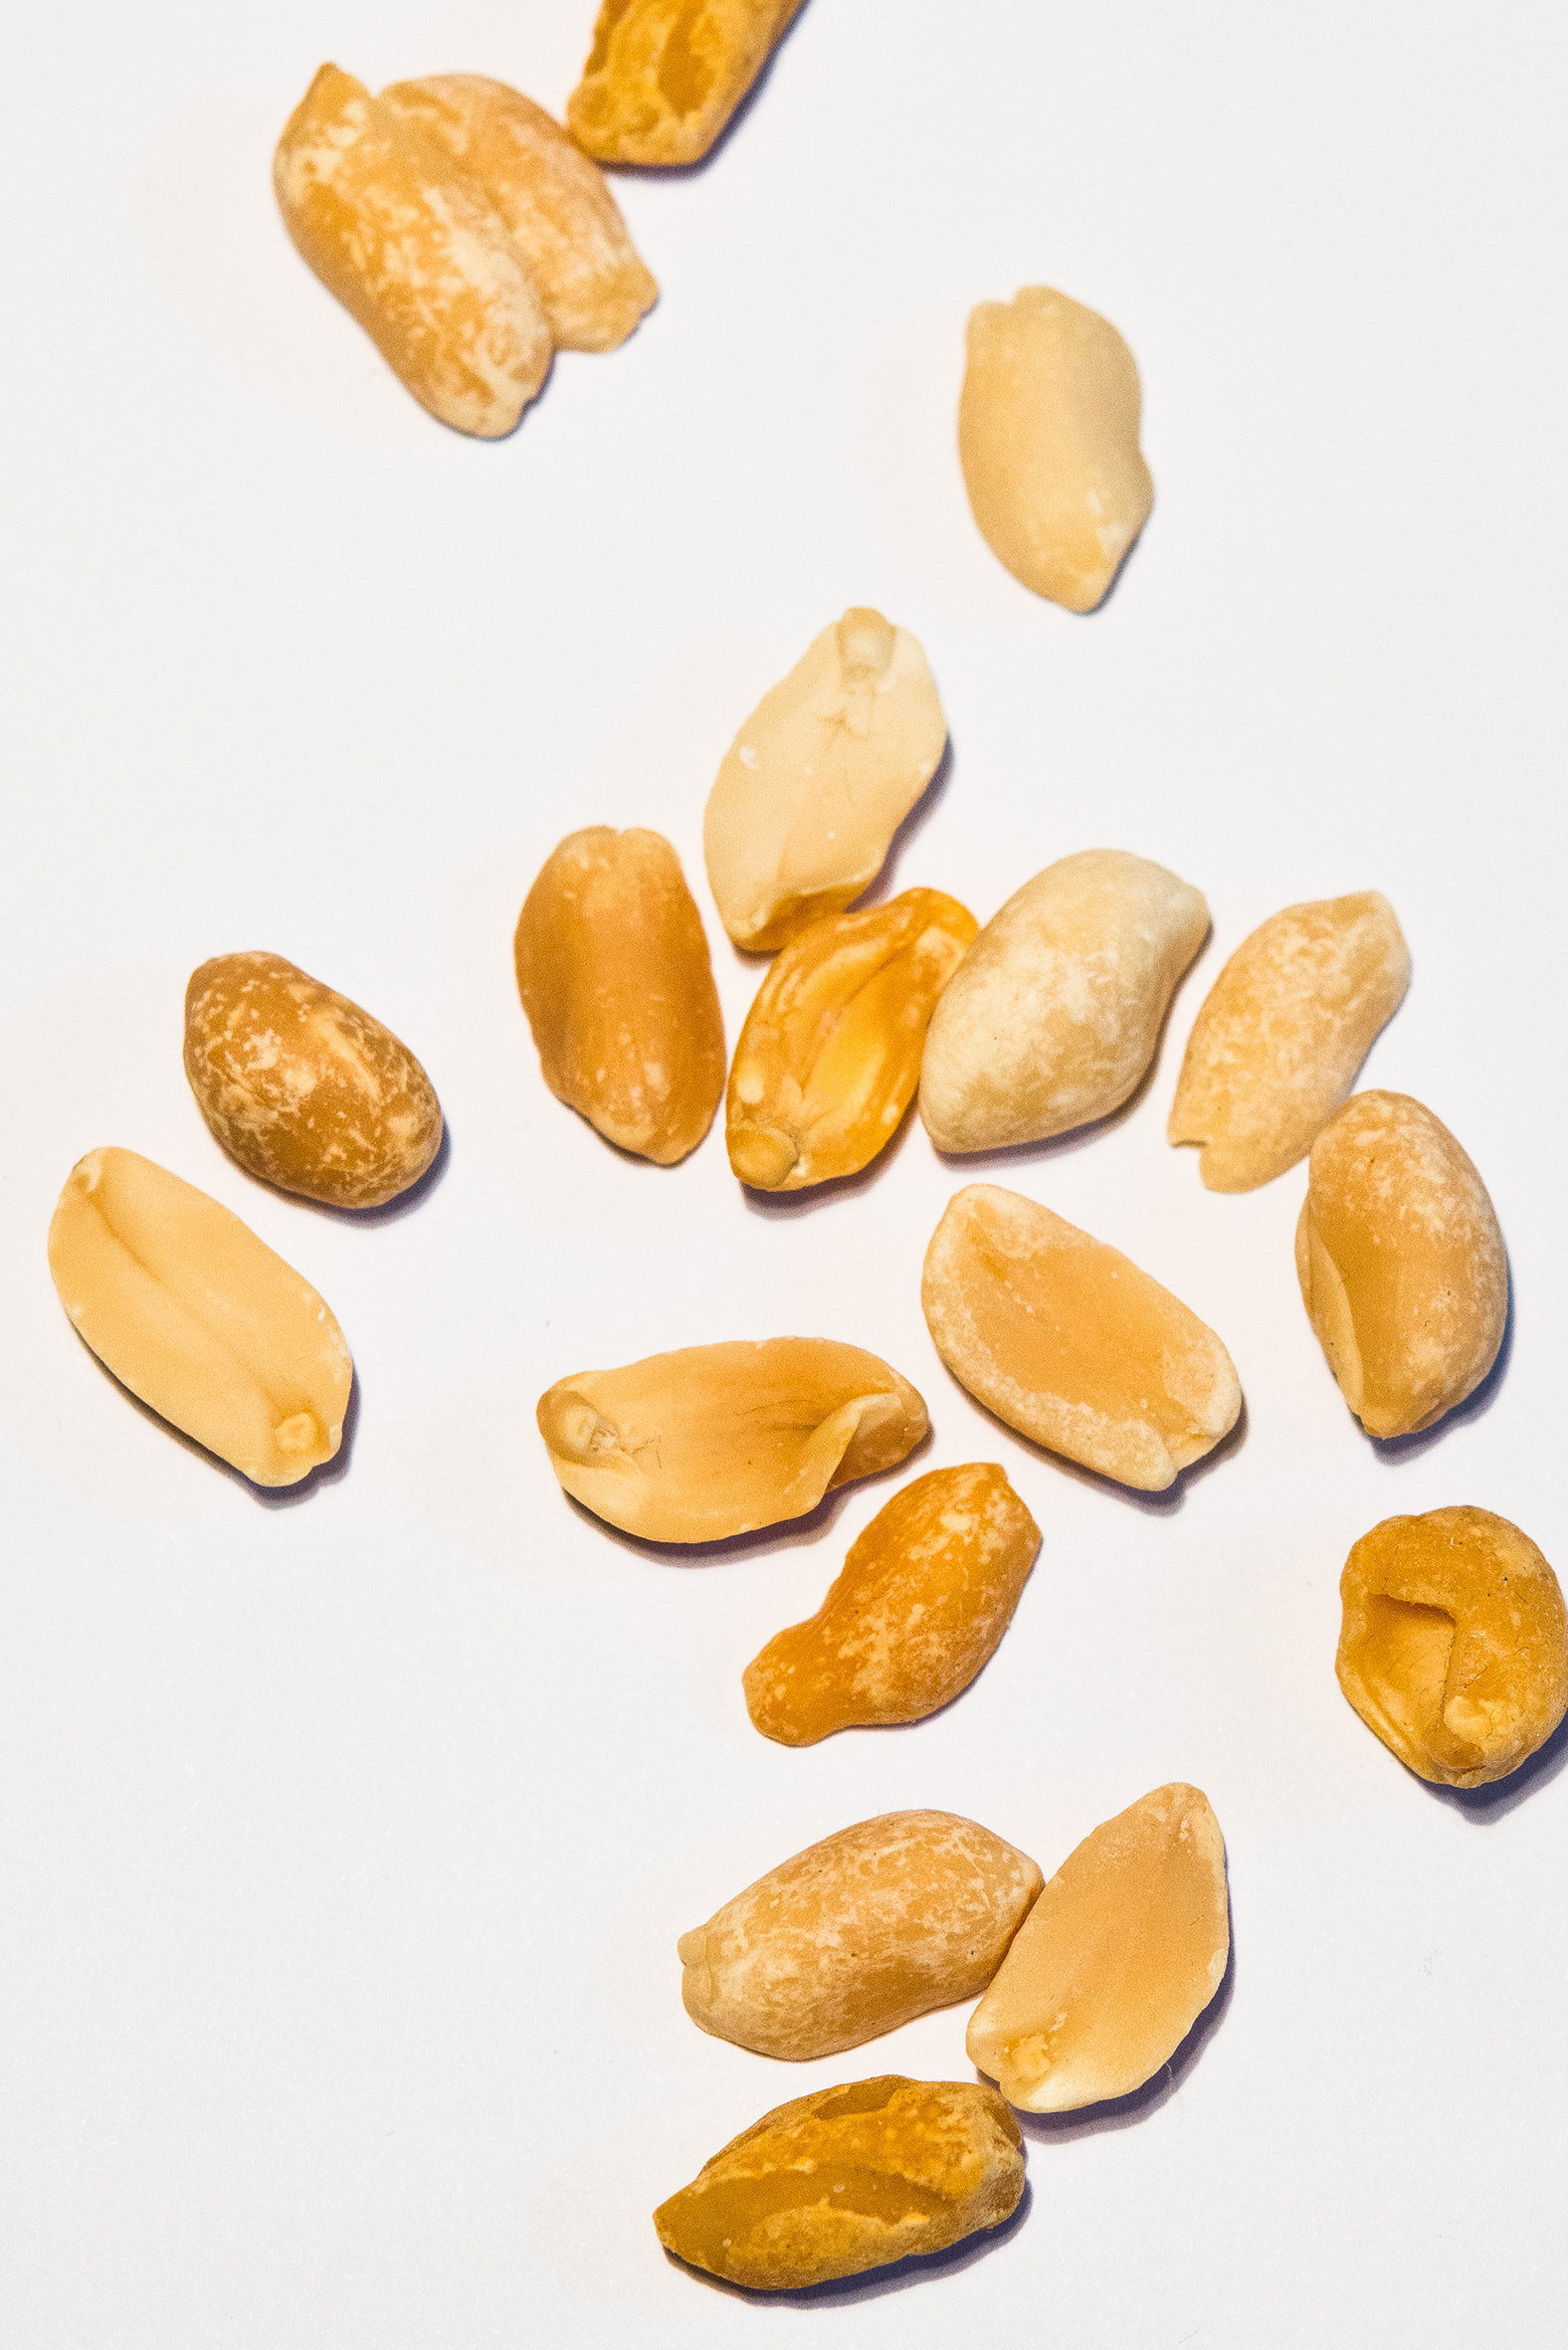 Eva Dittrich, peanuts, 2019